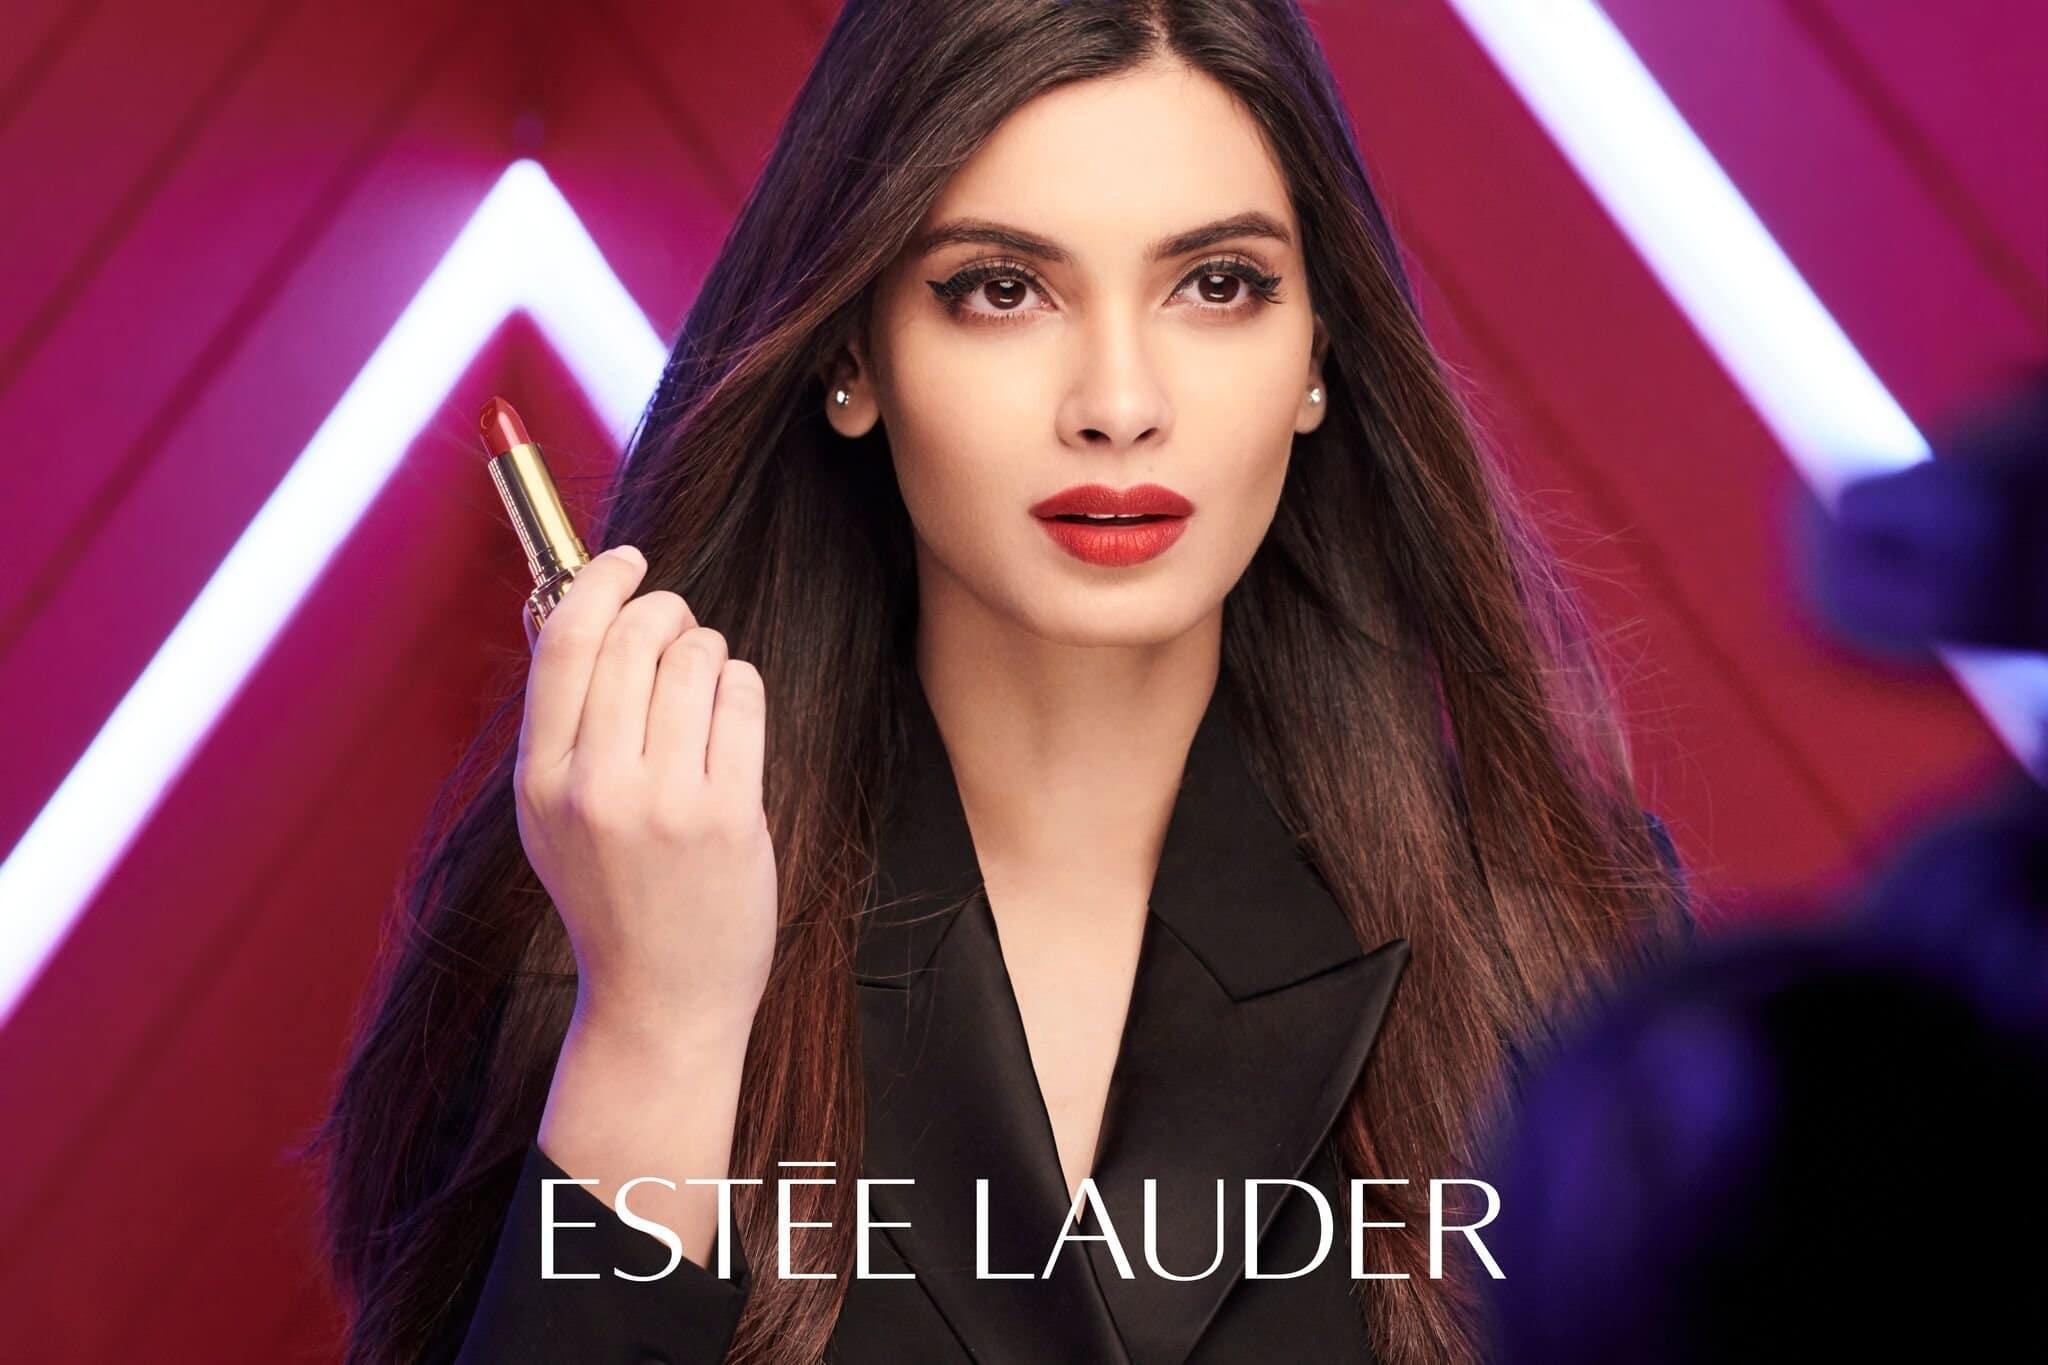 Video: Estée Lauder has appointed Diana Penty as India's first brand ambassador